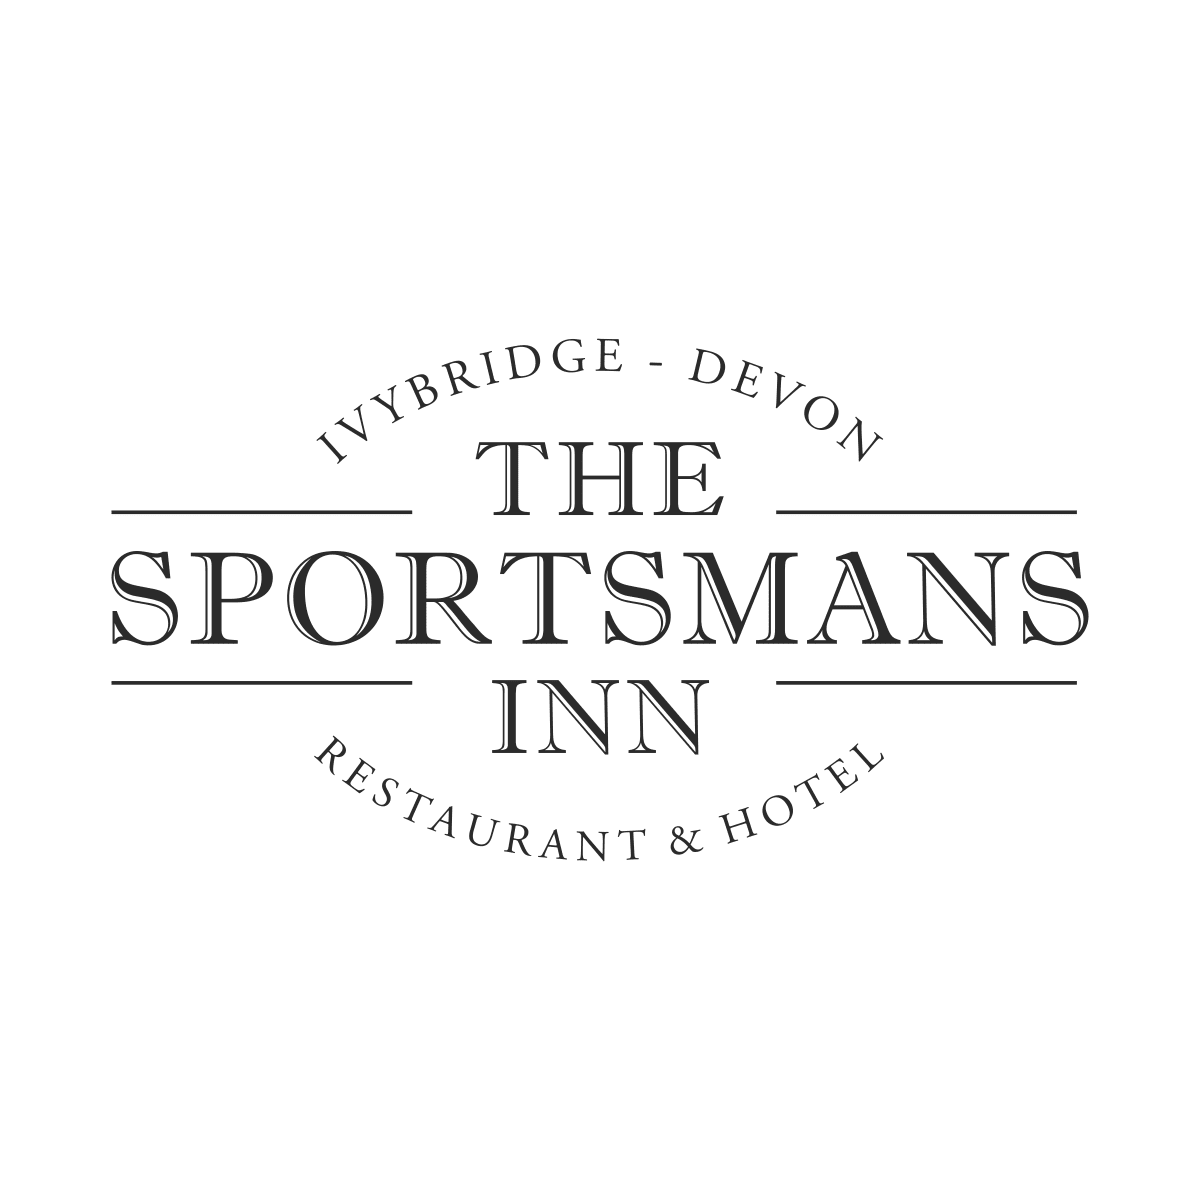 Logo Design Plymouth - The Sportsmans Inn - Web Design and SEO Company